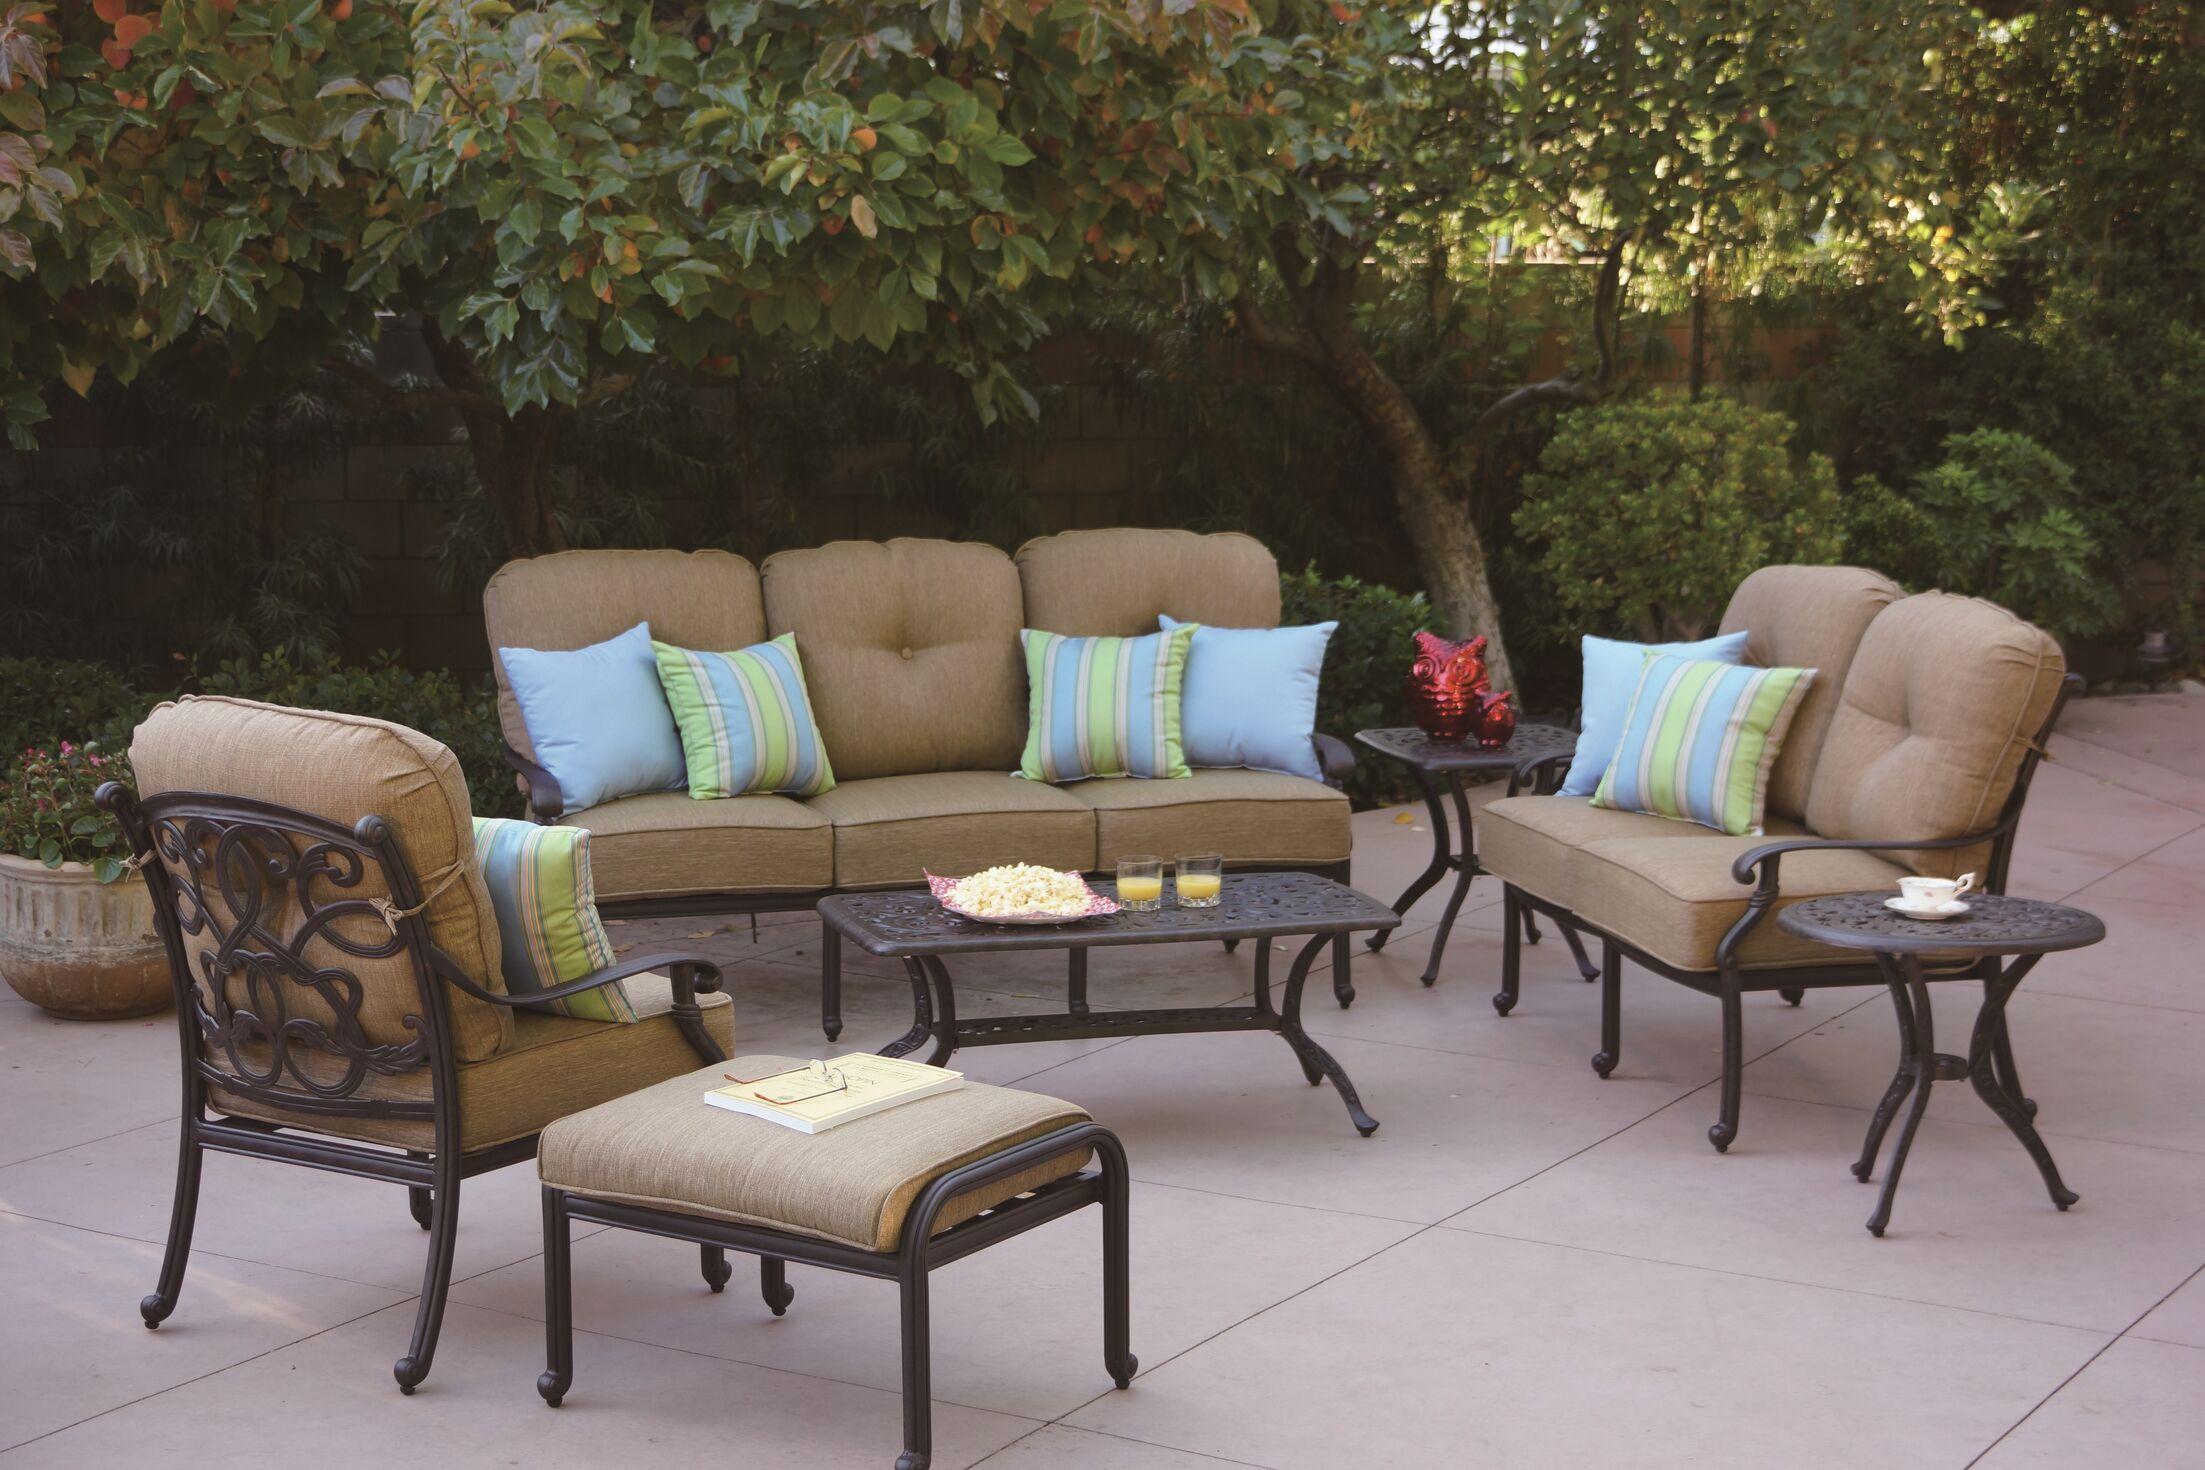 Calhoun 4 Piece Sofa Set with Cushions